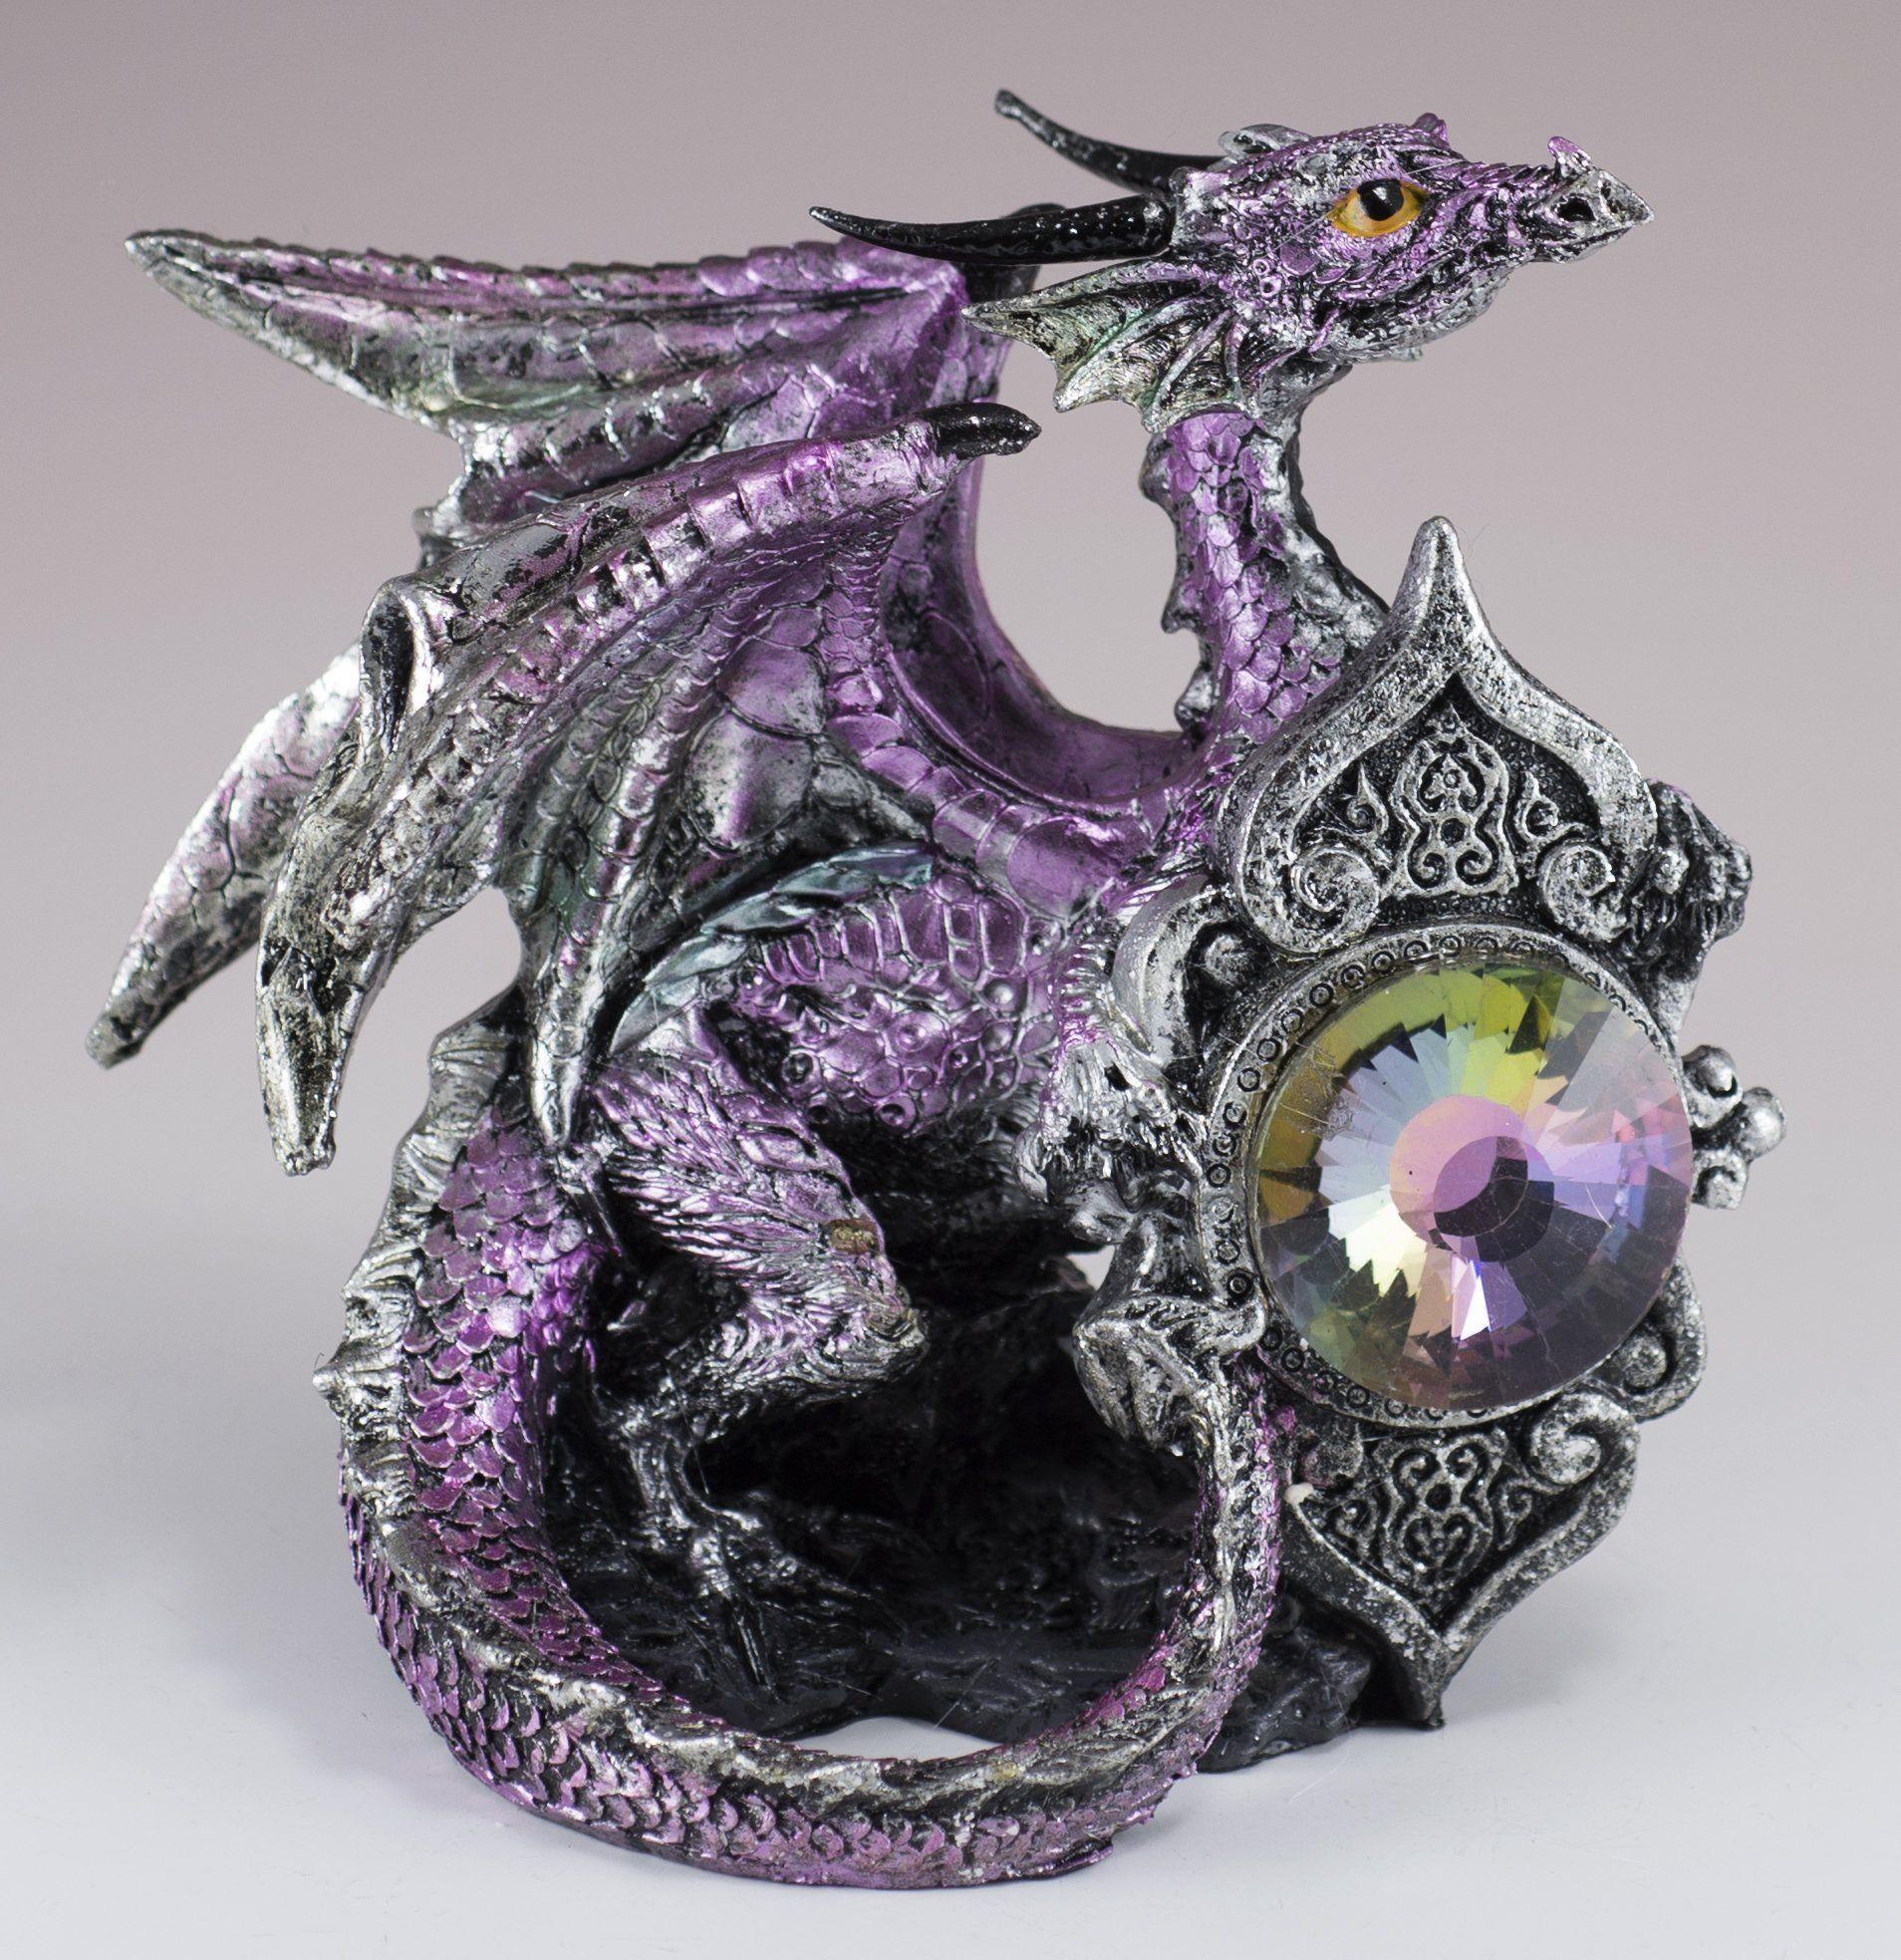 Dragon Beauty with Purple Rose Jewelry//Trinket Box Figurine